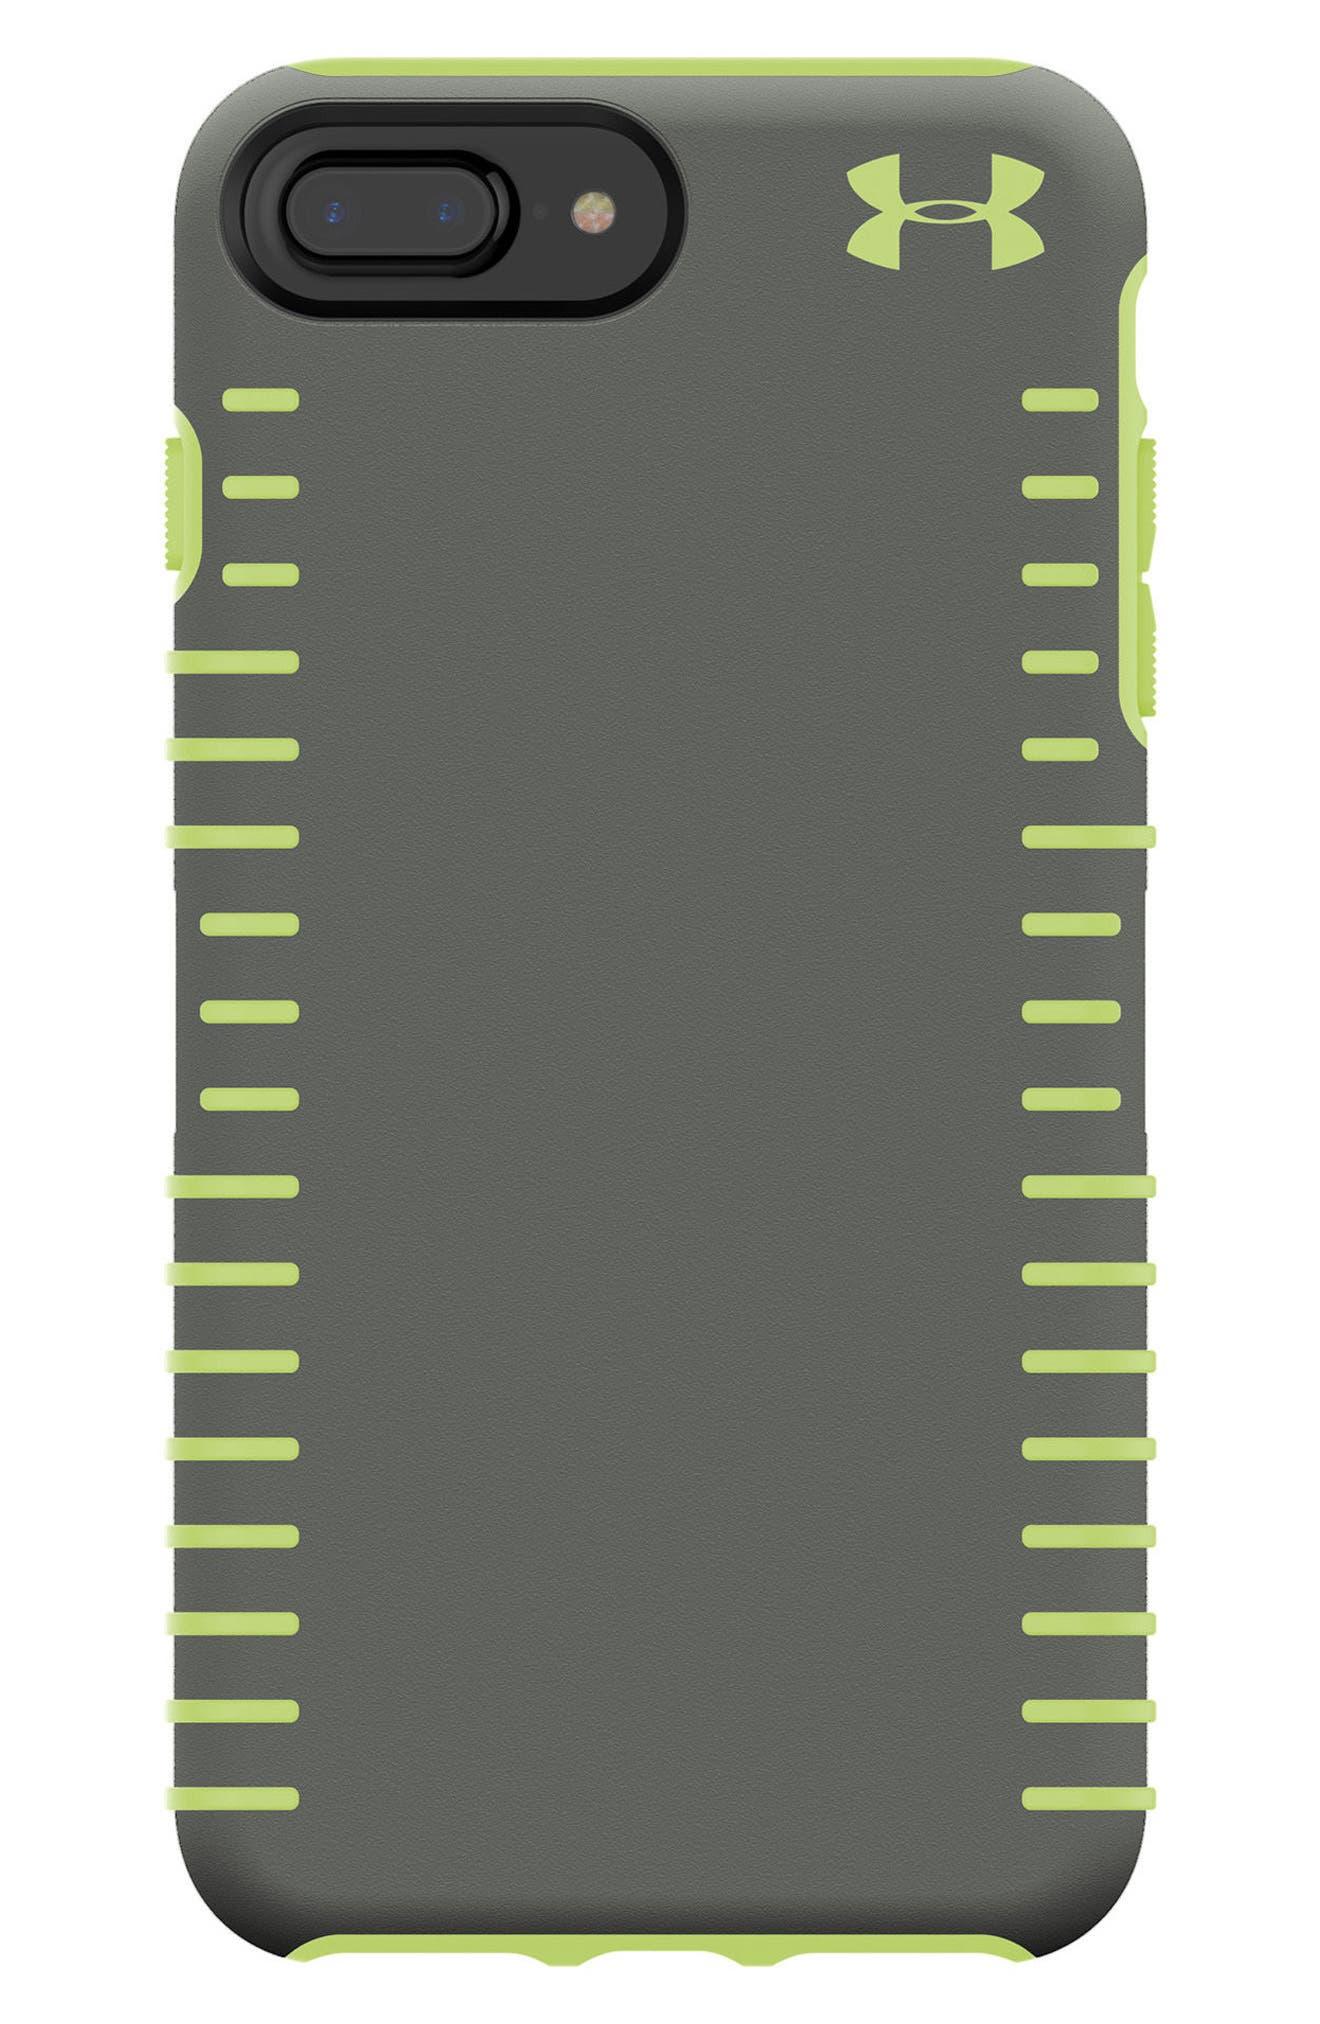 Under Armour Protect Grip iPhone 6/6s/7/8 Plus Case